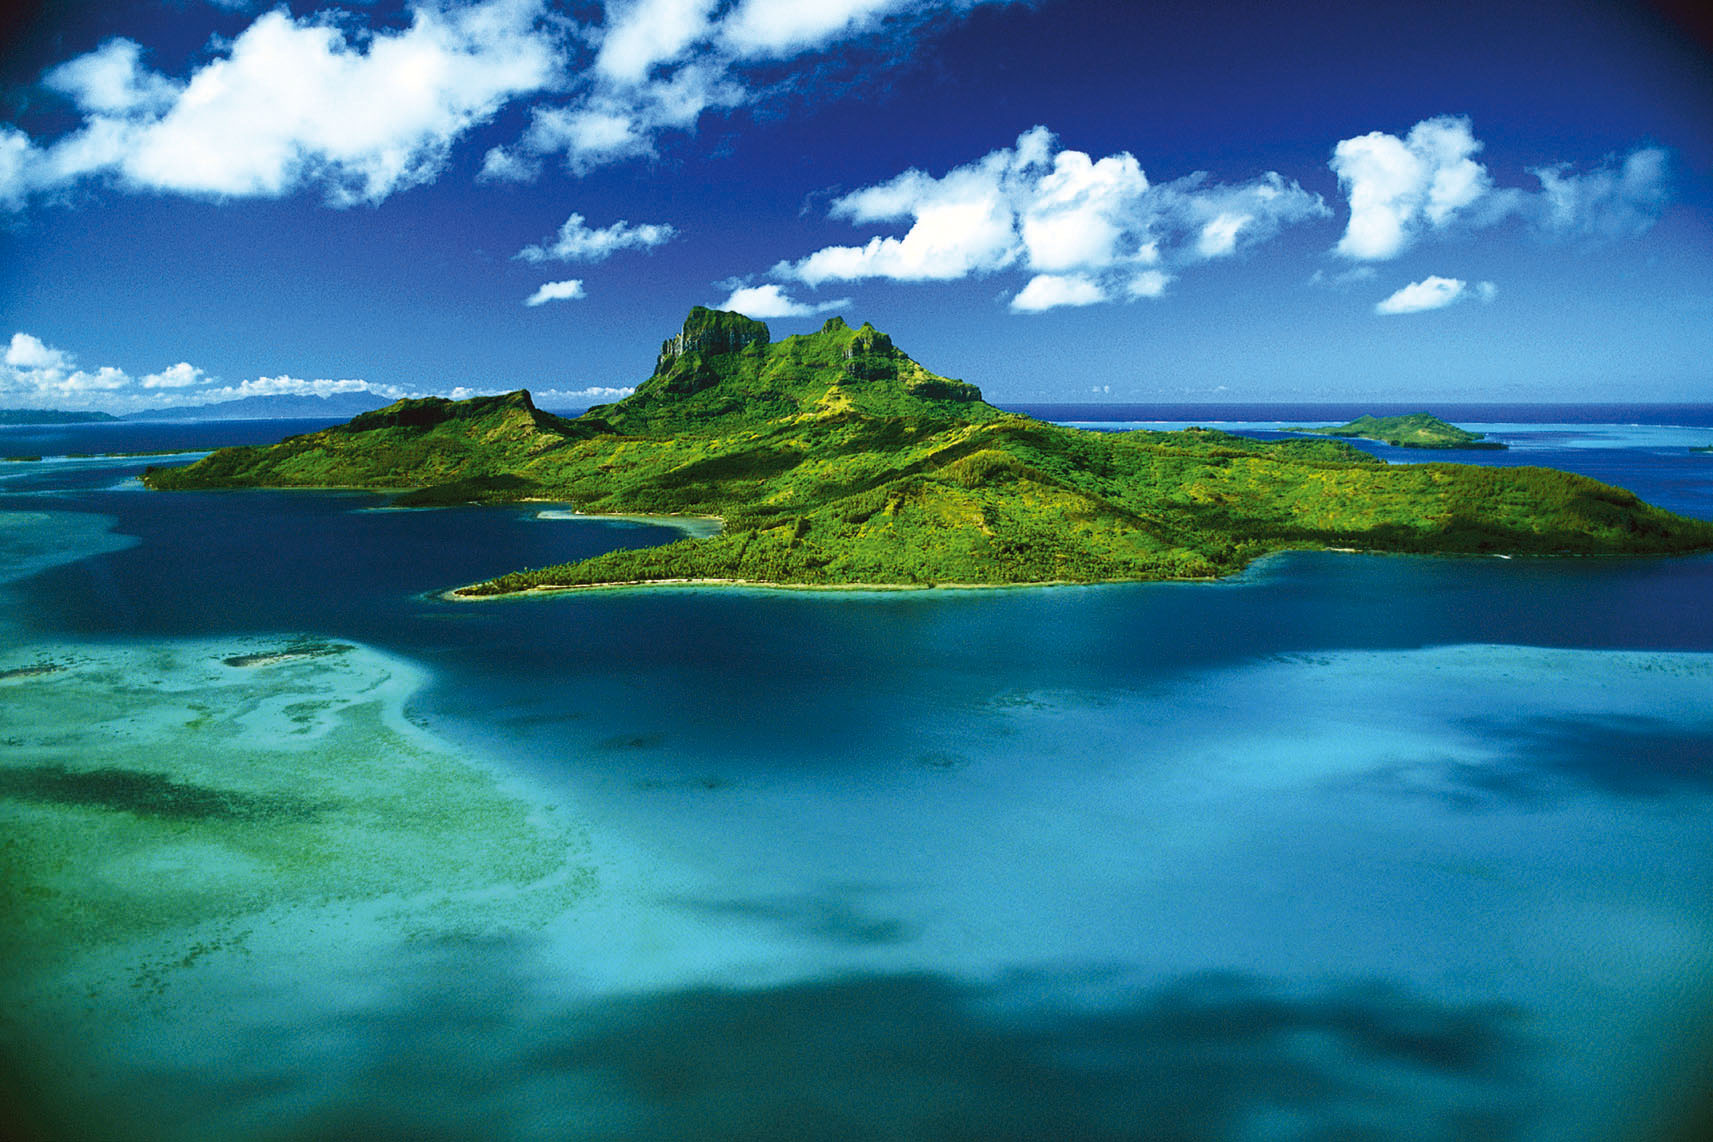 Aerial View of Bora Bora